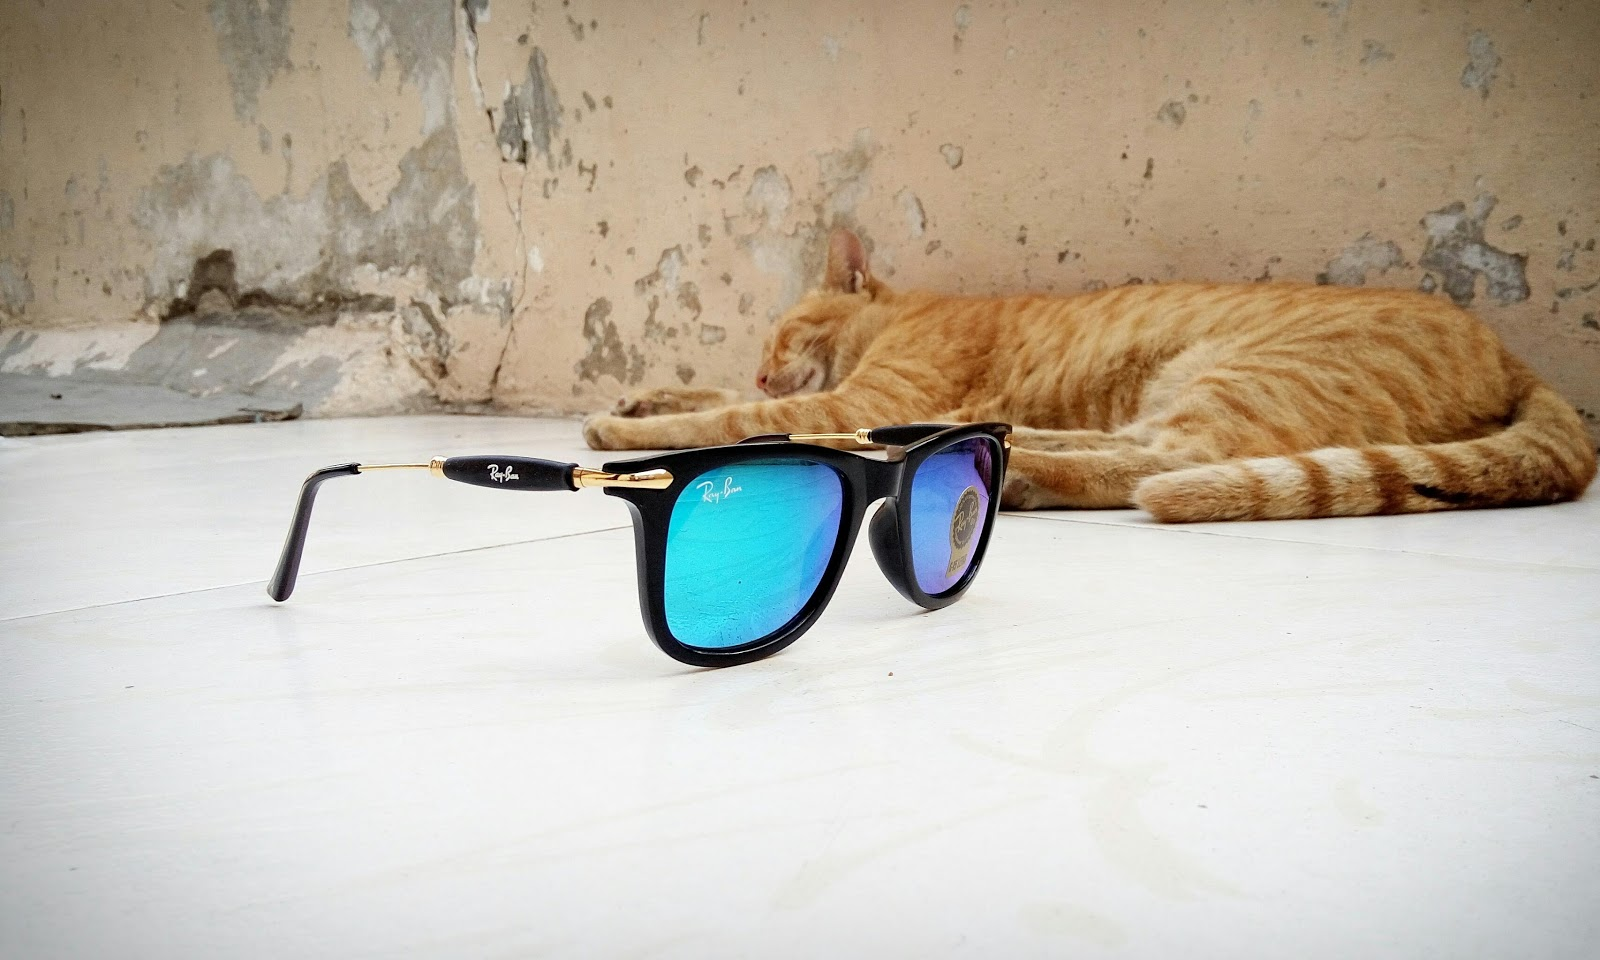 e6df8f54ca7 Rayban brand new stylish rb2148 sunglass